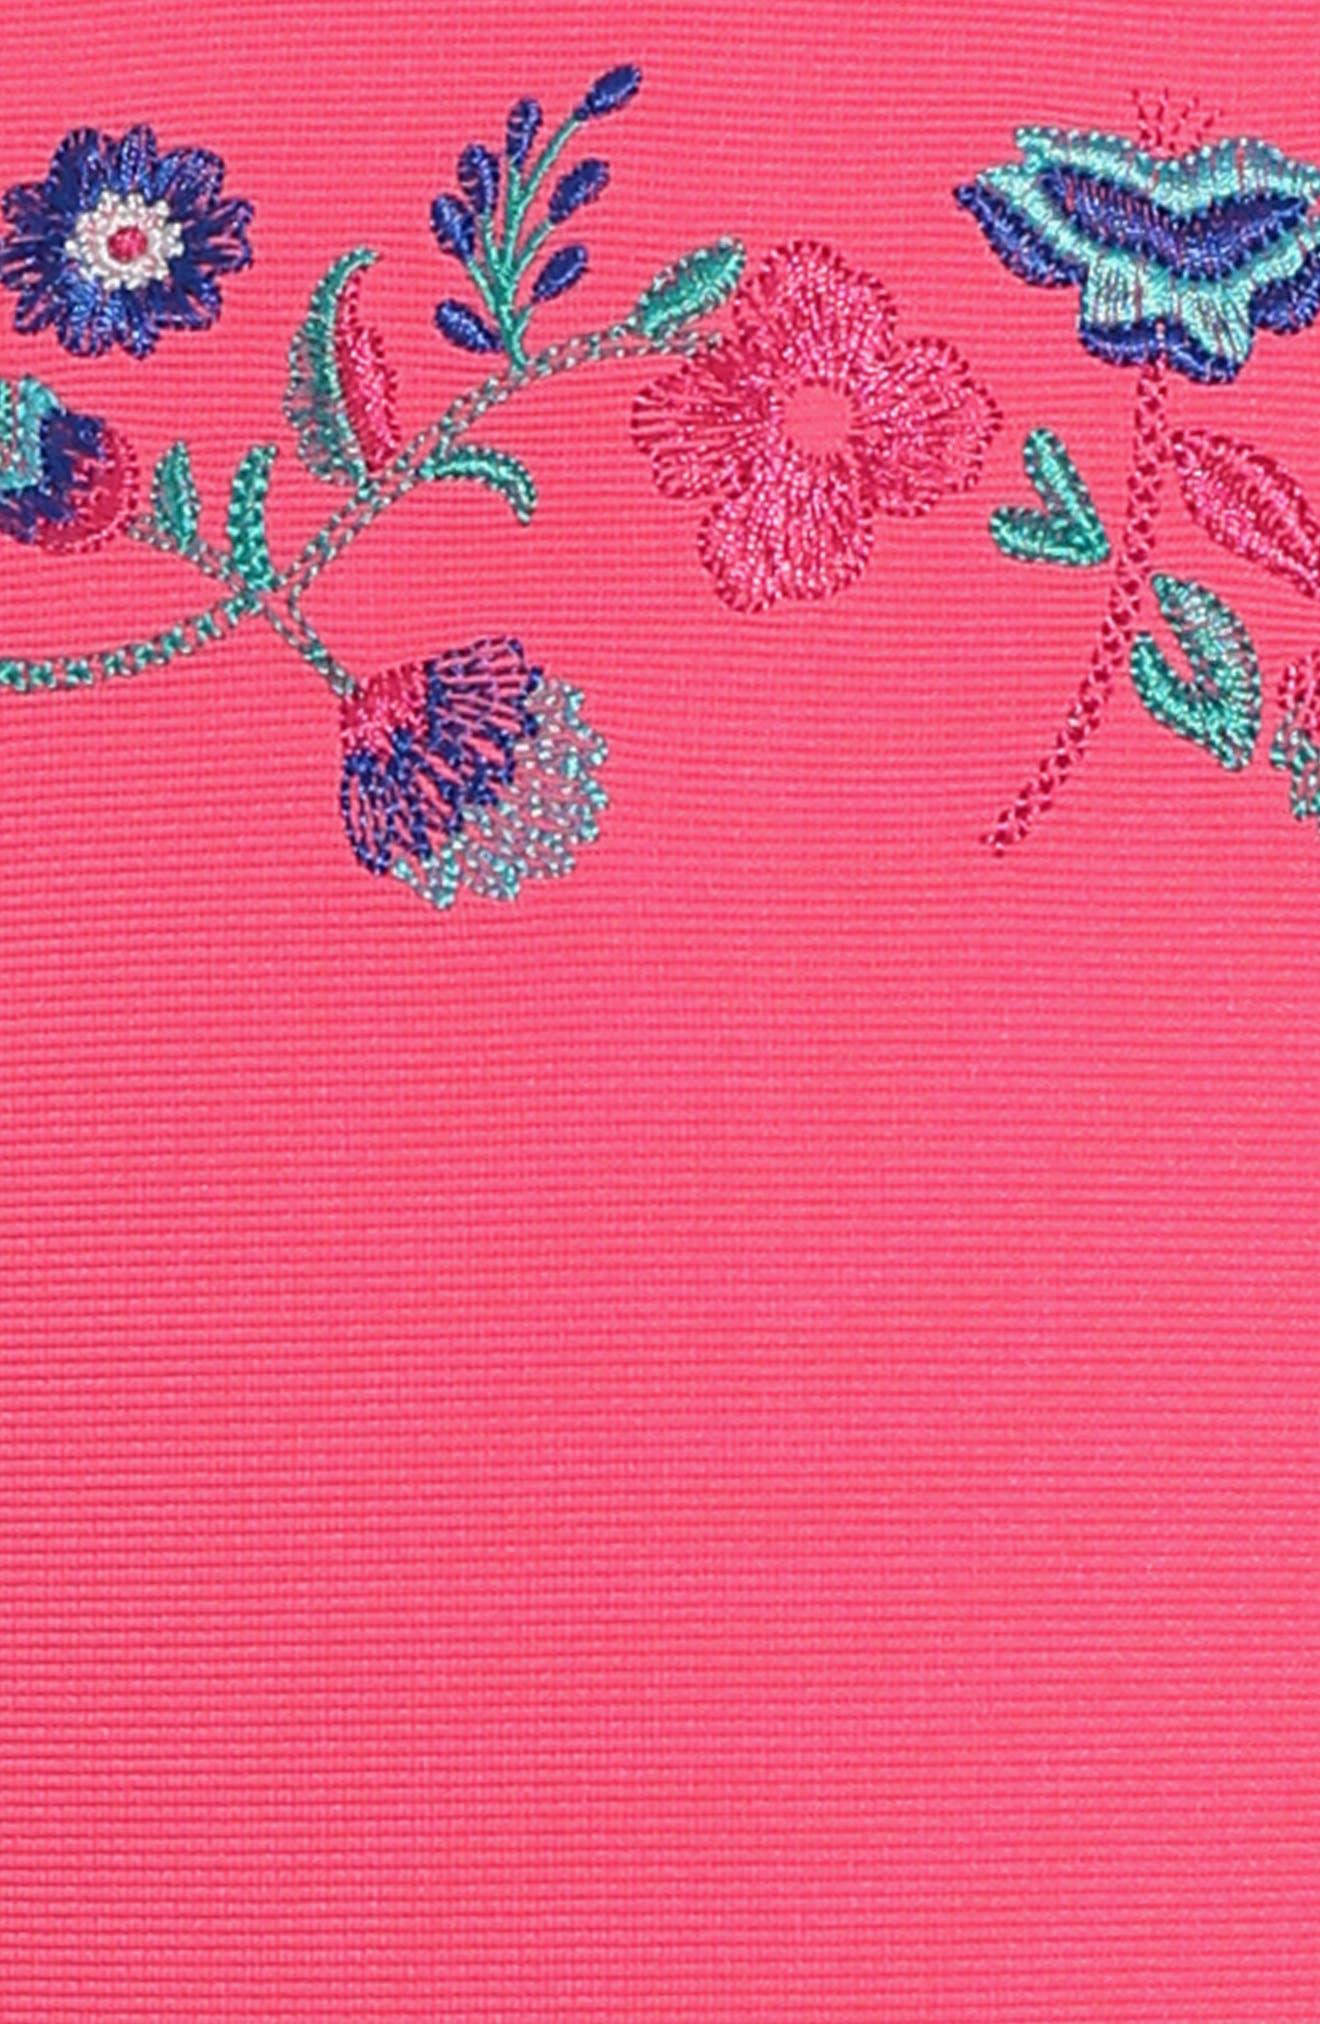 Drop Waist Dress,                             Alternate thumbnail 3, color,                             650